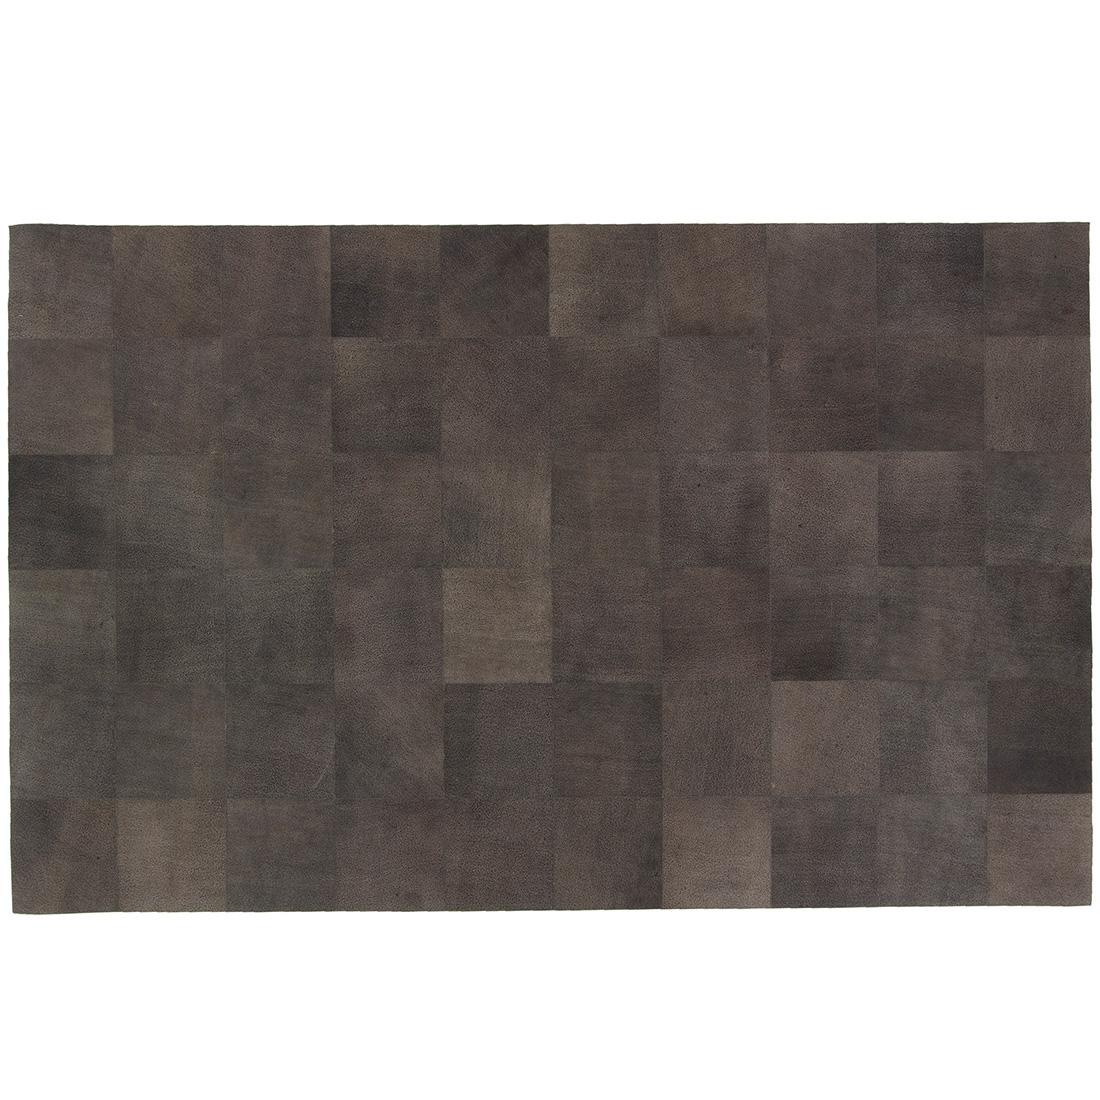 Vloerkleed Brinker Rosso Stone | 200 x 300 cm